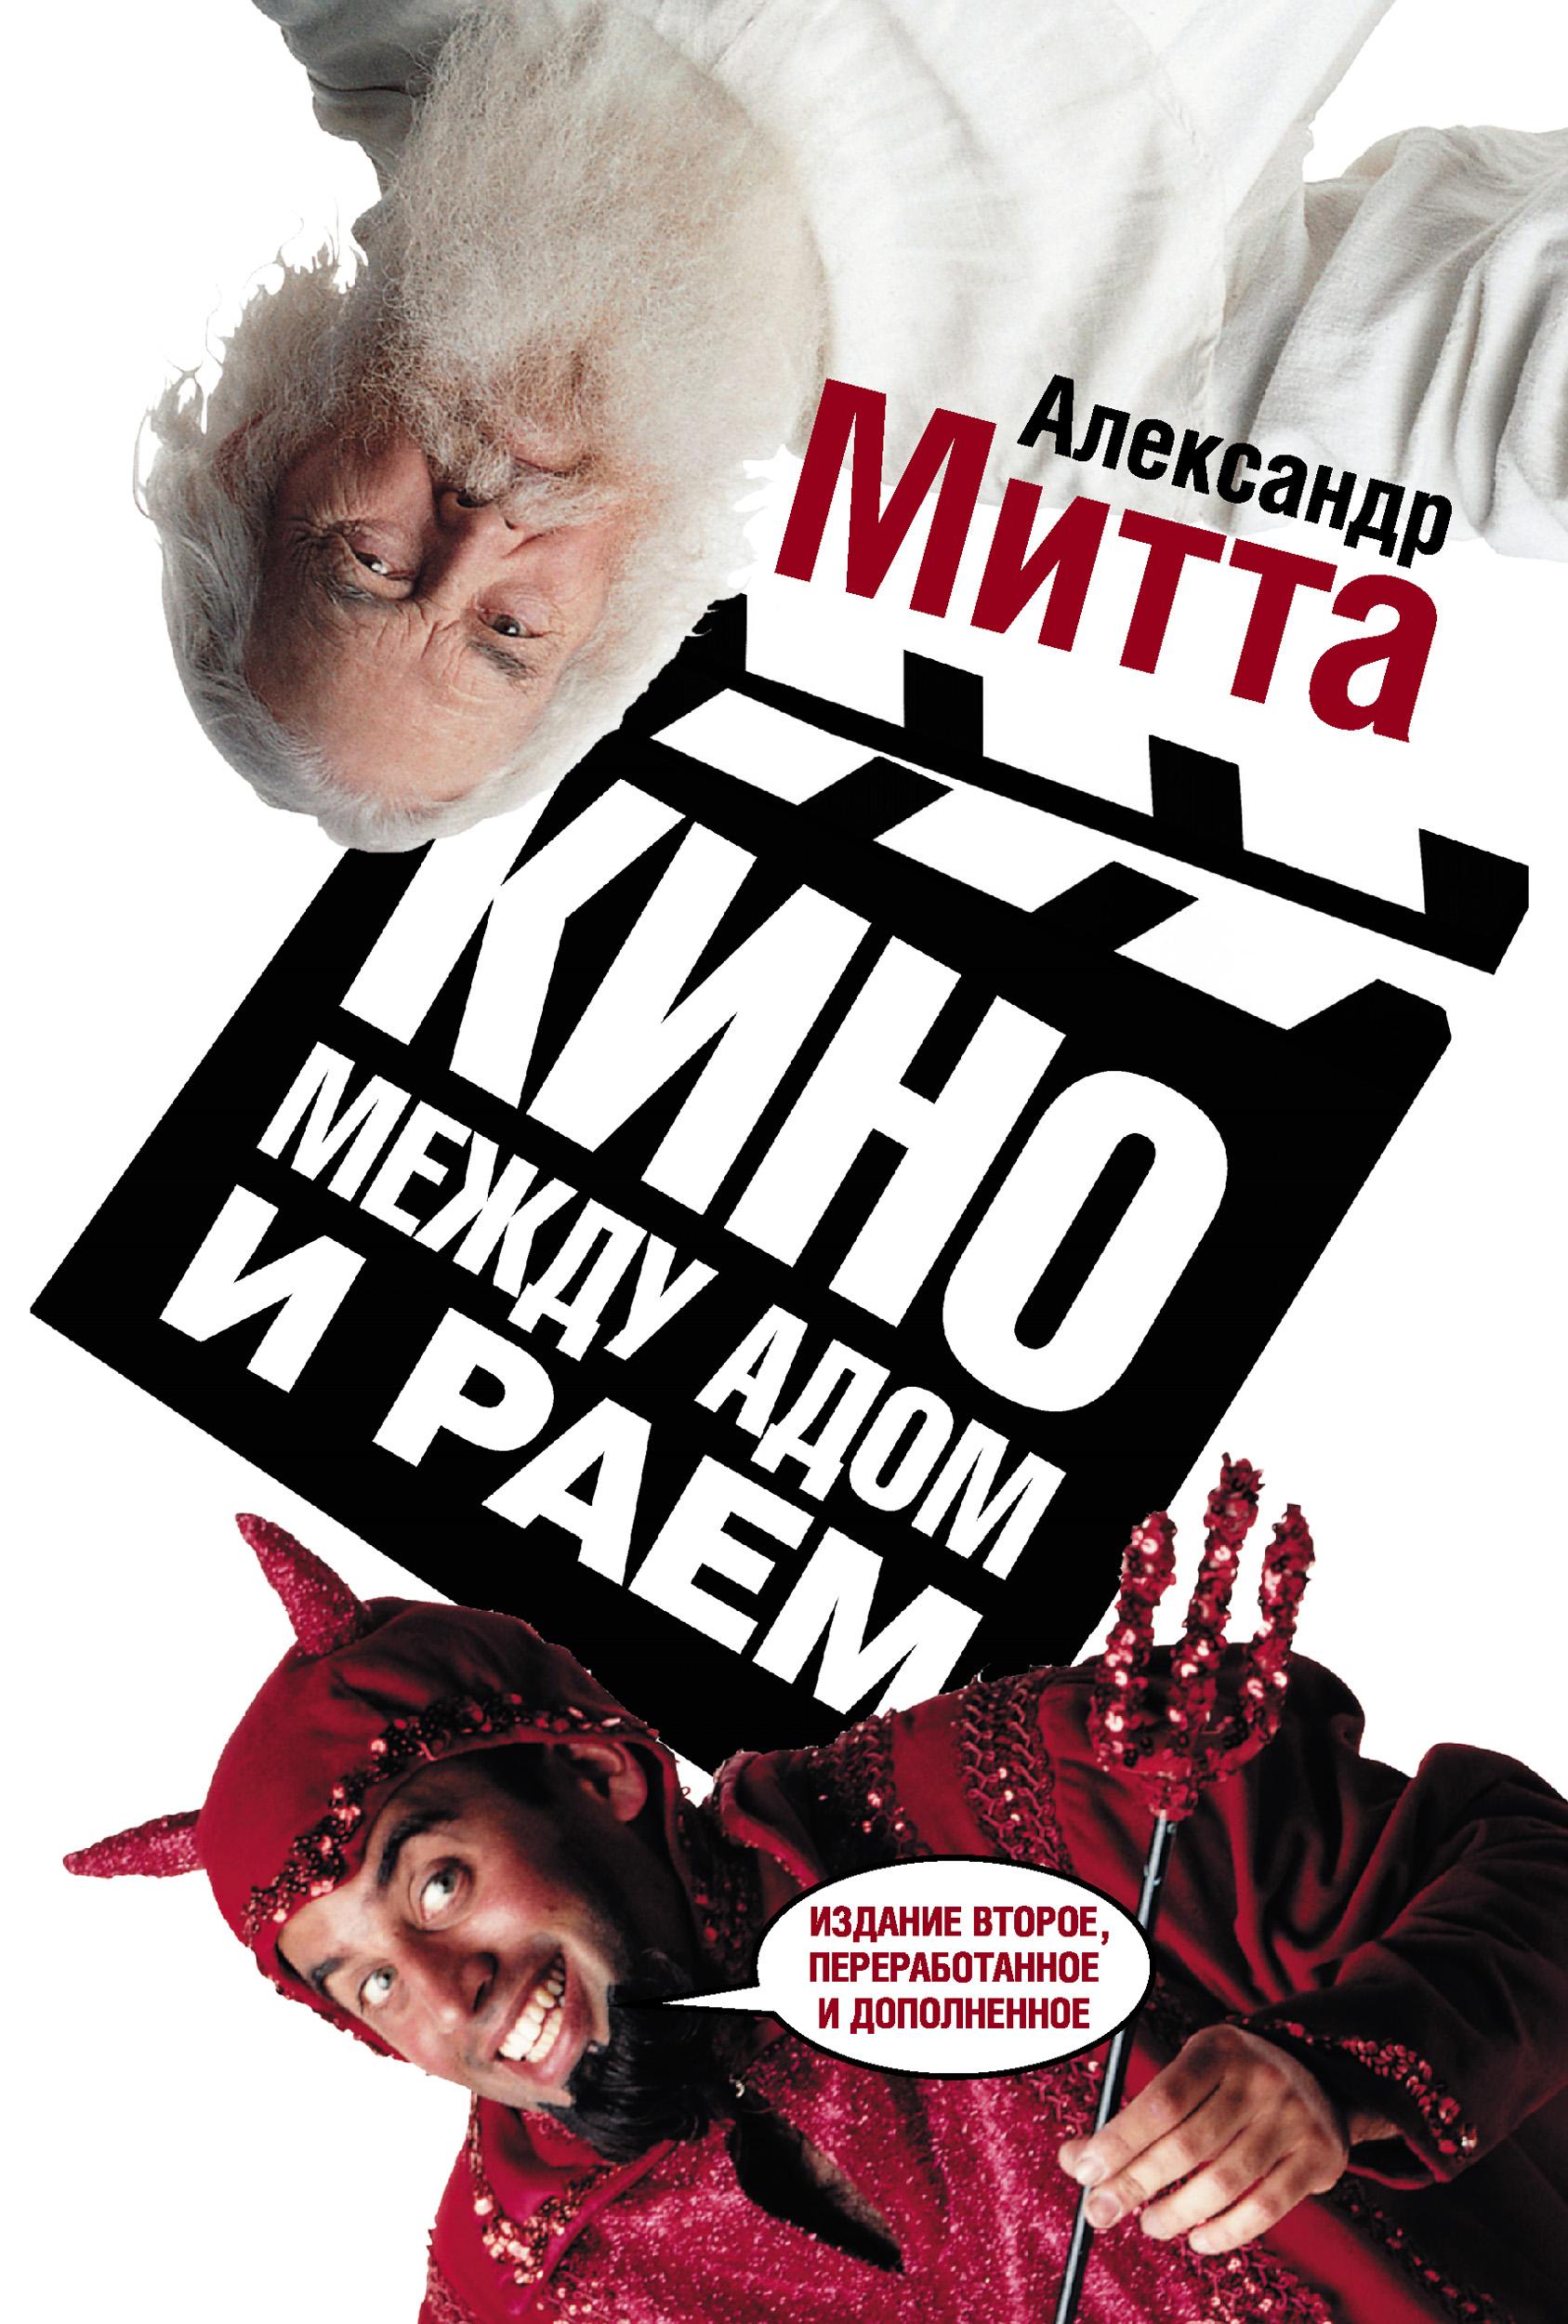 Александр Митта Кино между адом и раем александр митта кино между адом и раем